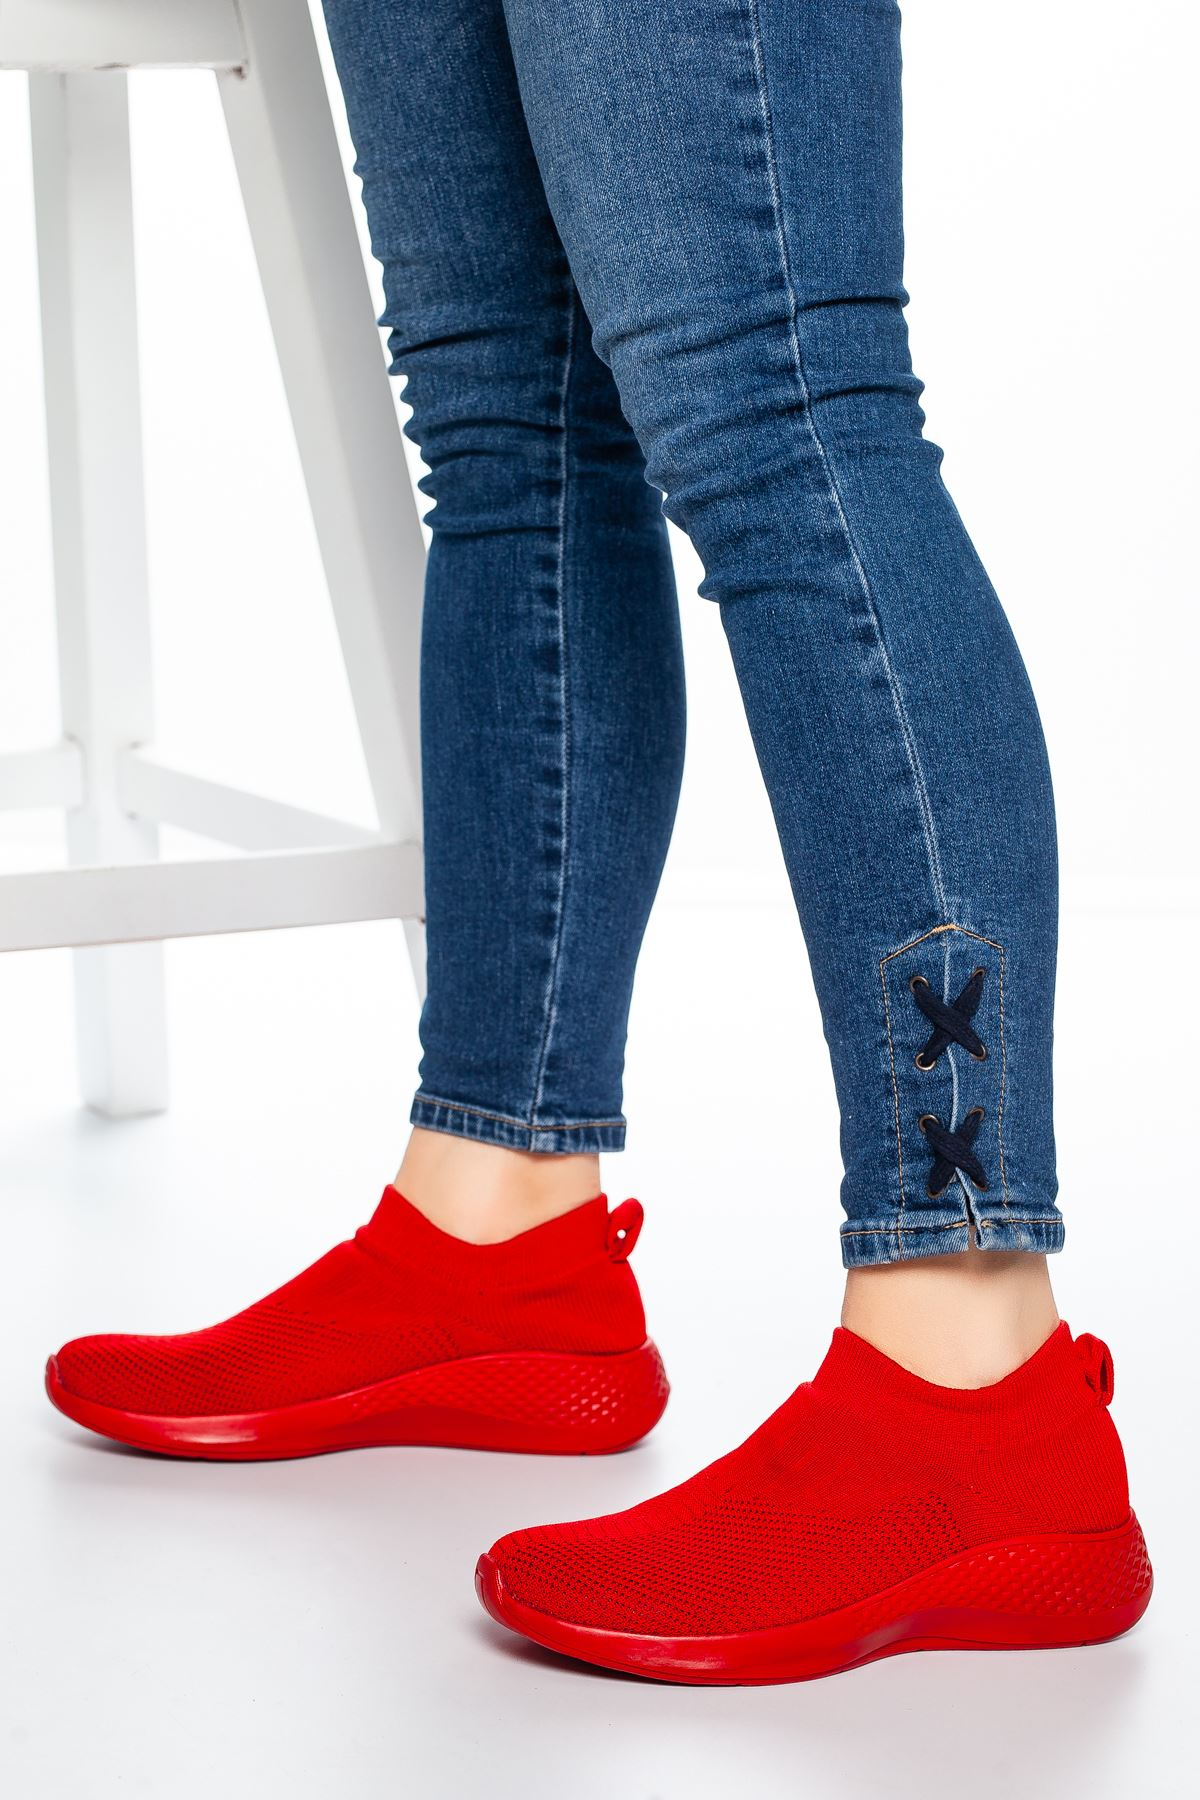 Nolan Lastikli Çorap Spor Kırmızı